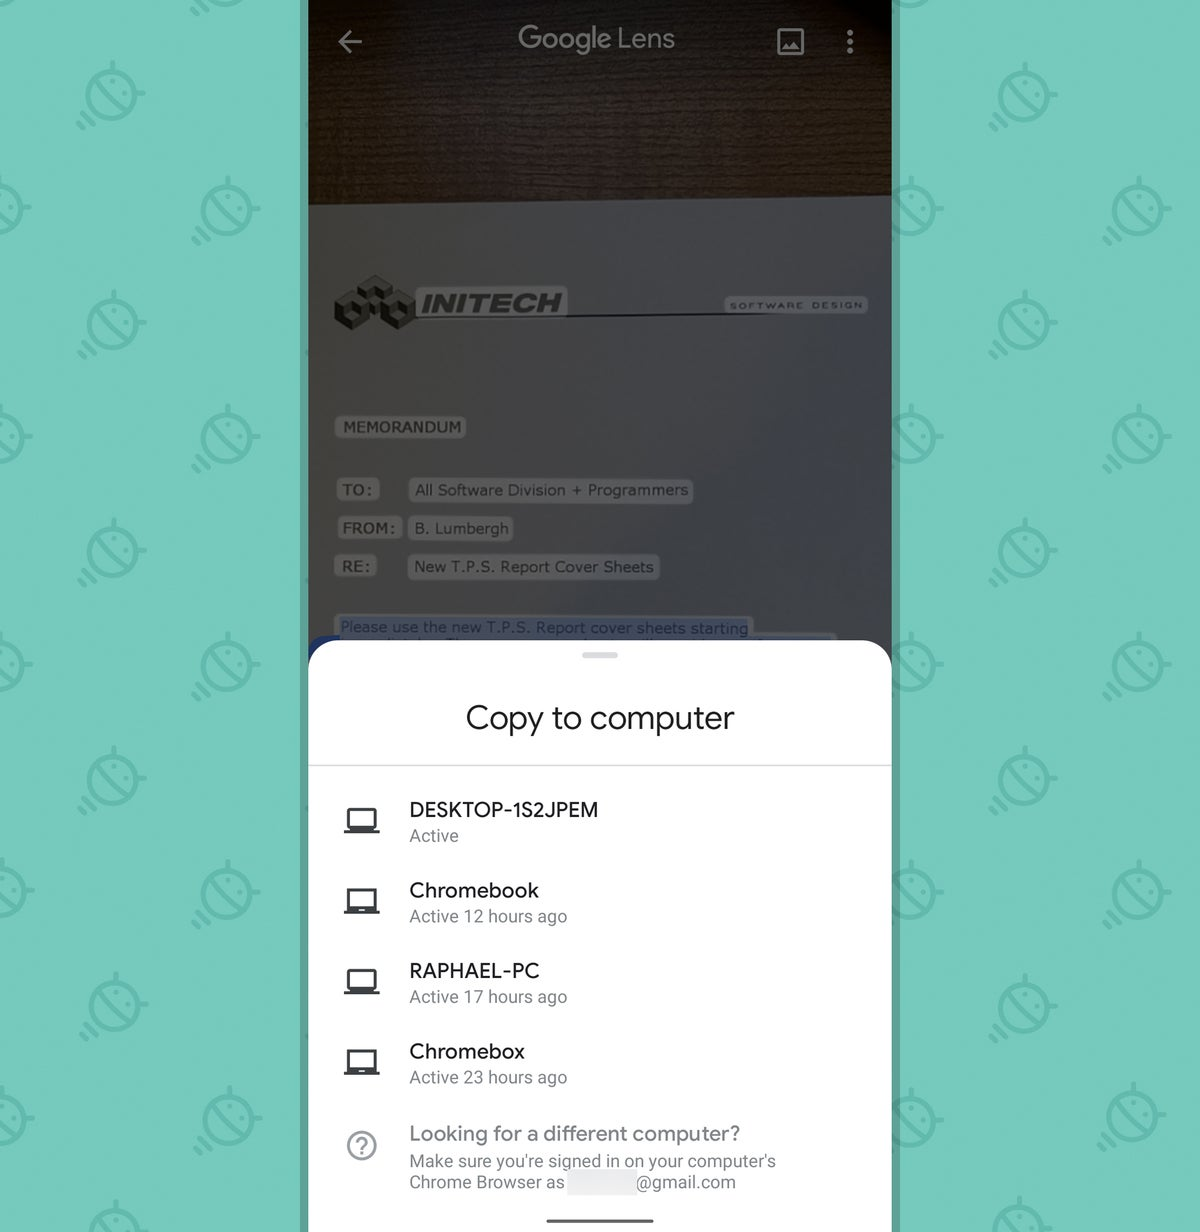 Google Lens App: Copy to computer